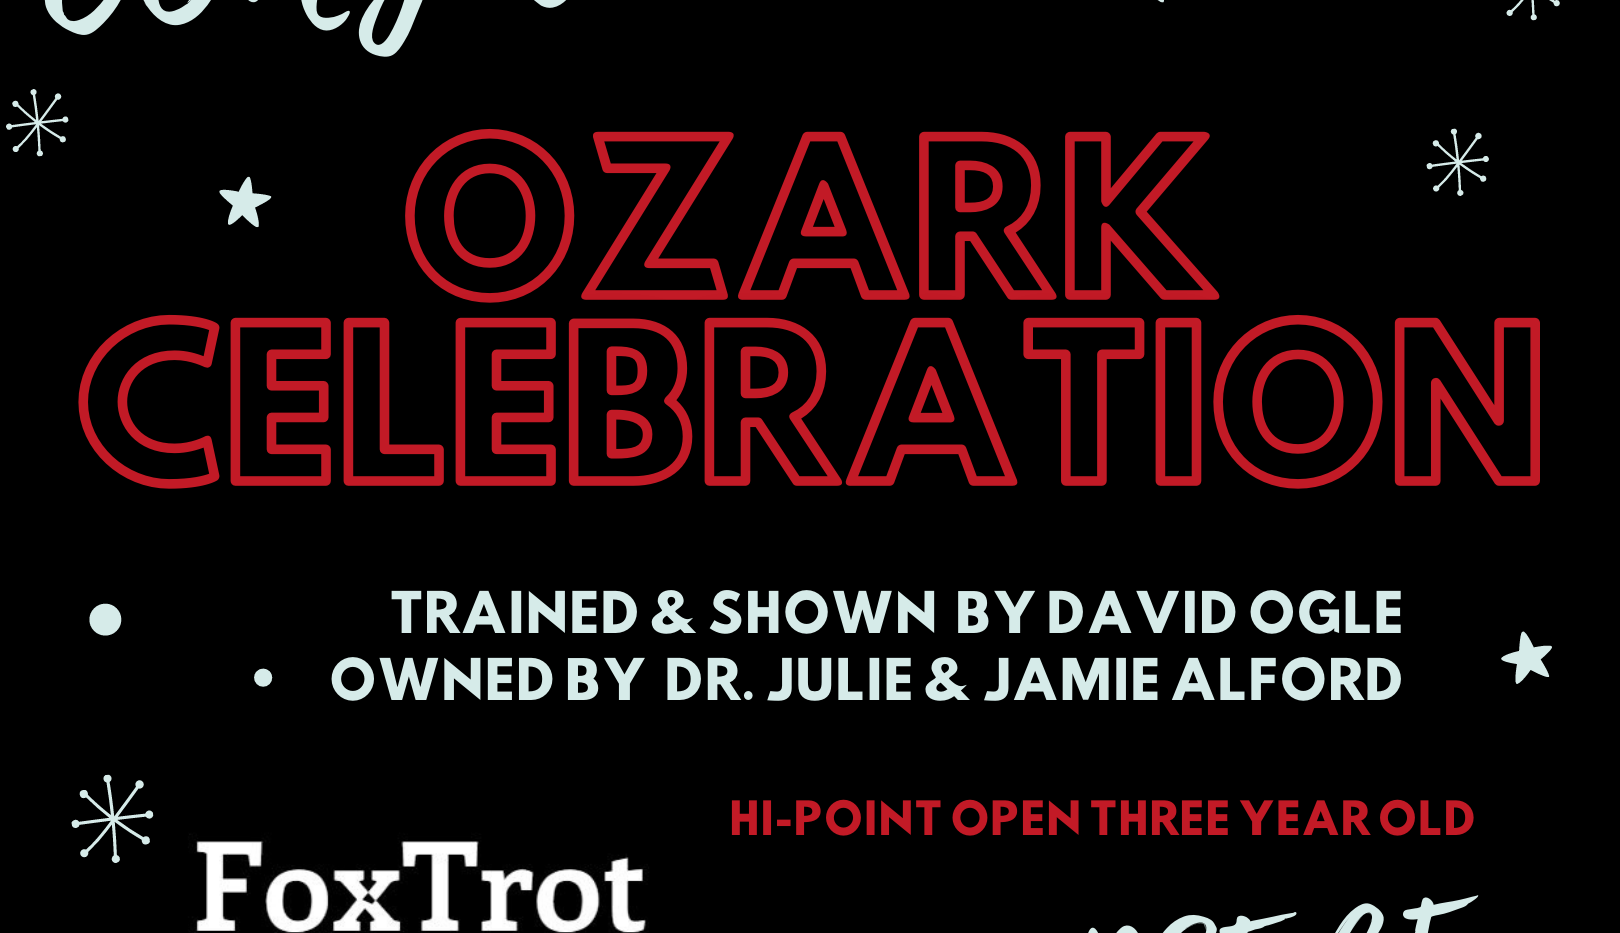 Ozark Celebration Horse of the Year.png